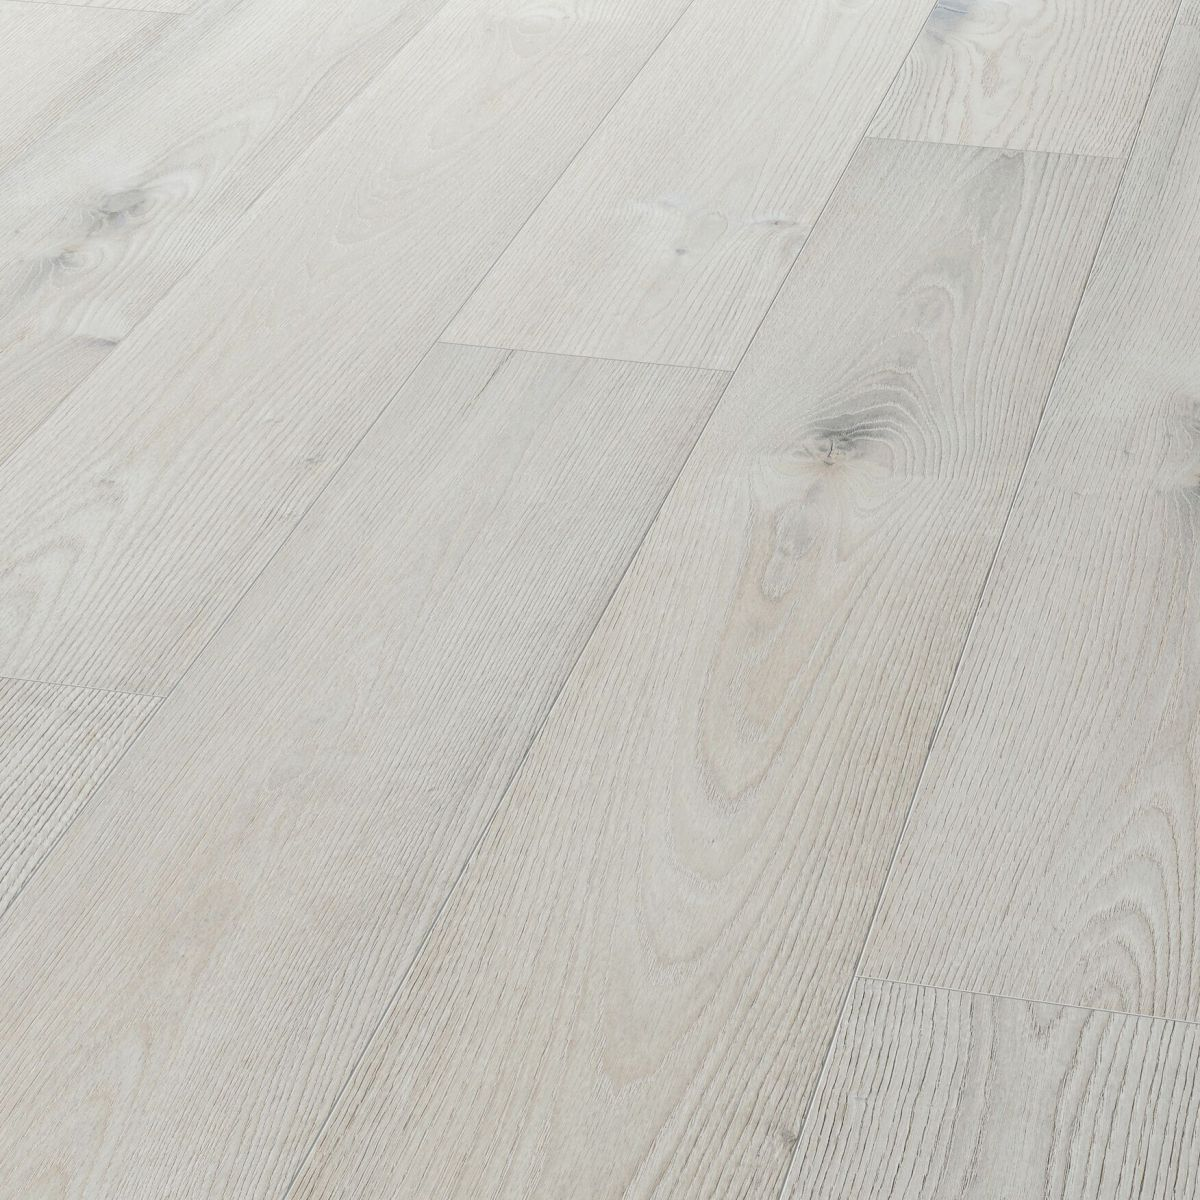 Avatara vloer hout K03 diagonaal